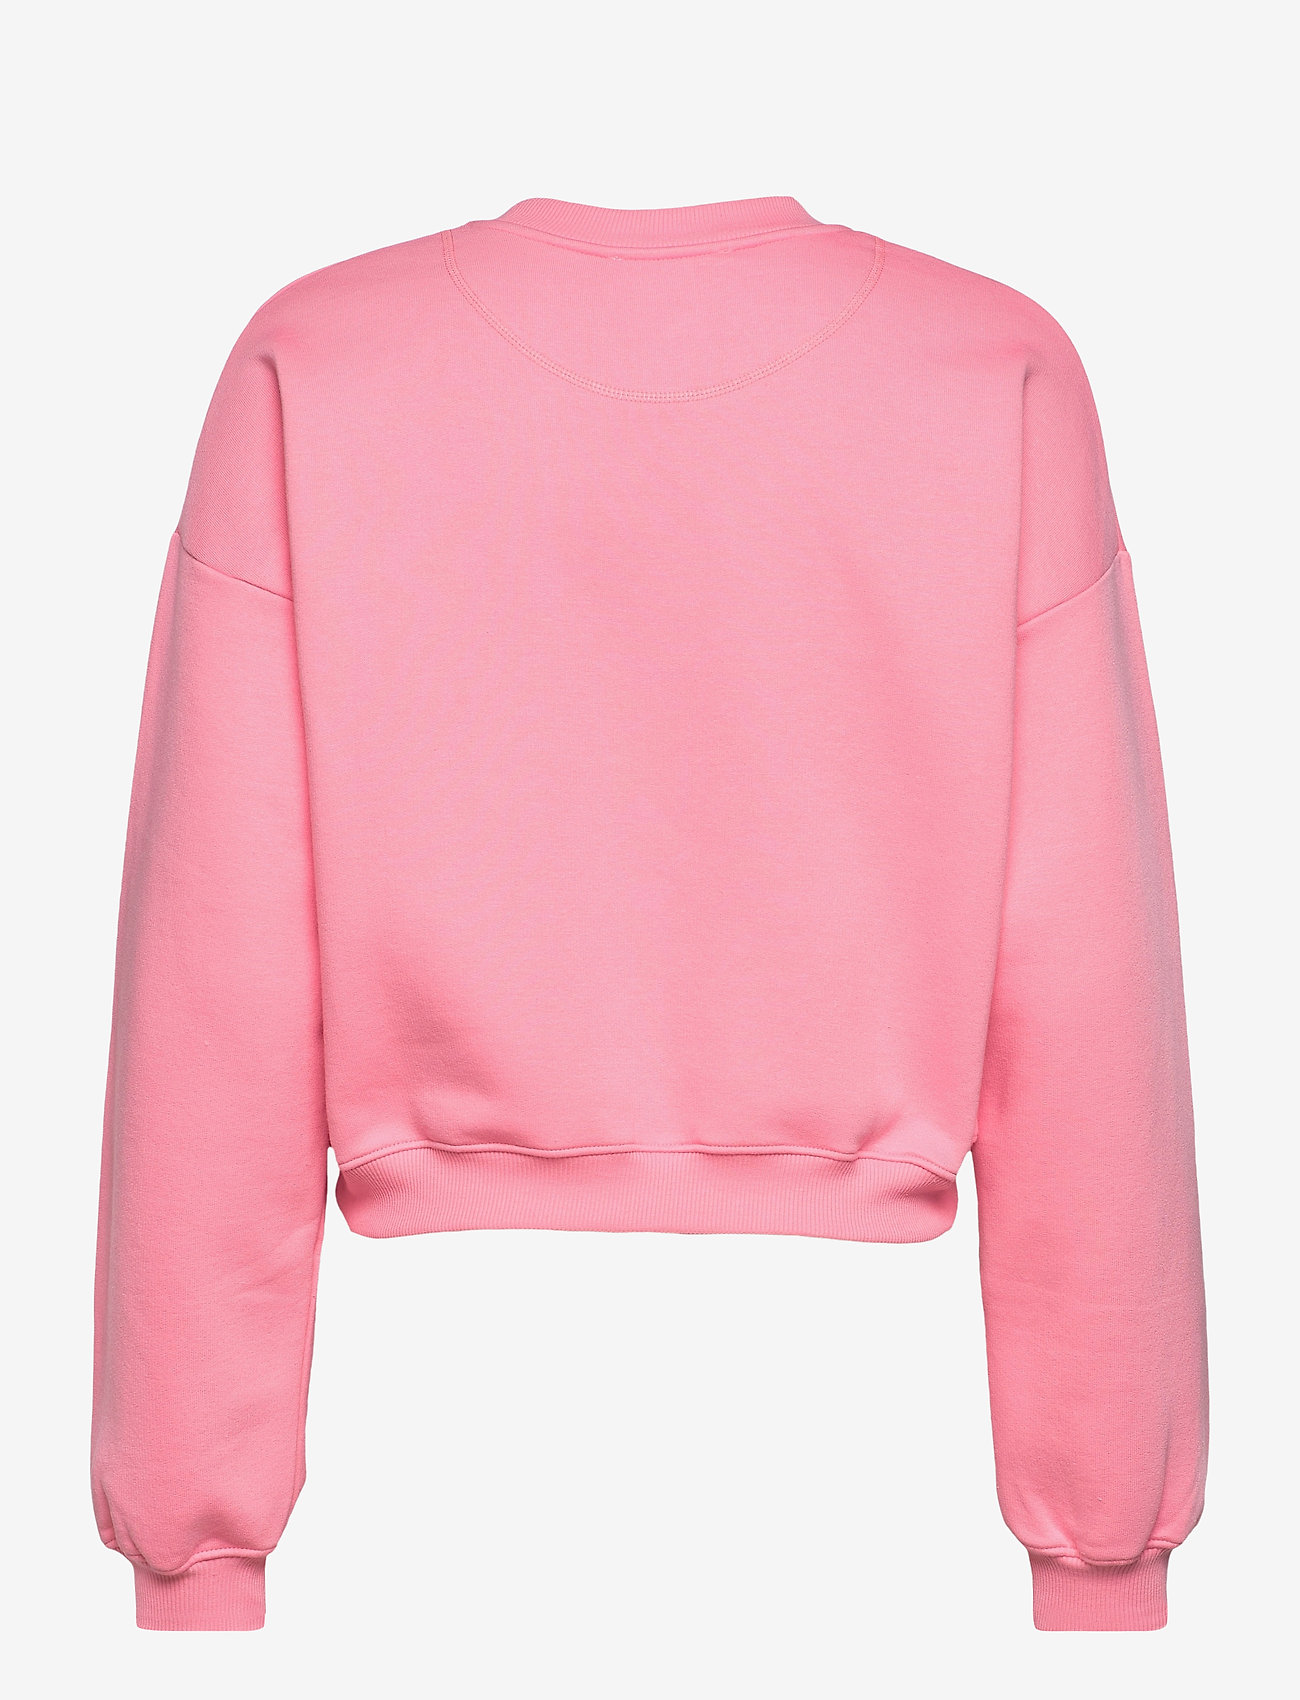 RODEBJER - RODEBJER KOLOMAN - sweatshirts & hættetrøjer - cherry blossom - 1